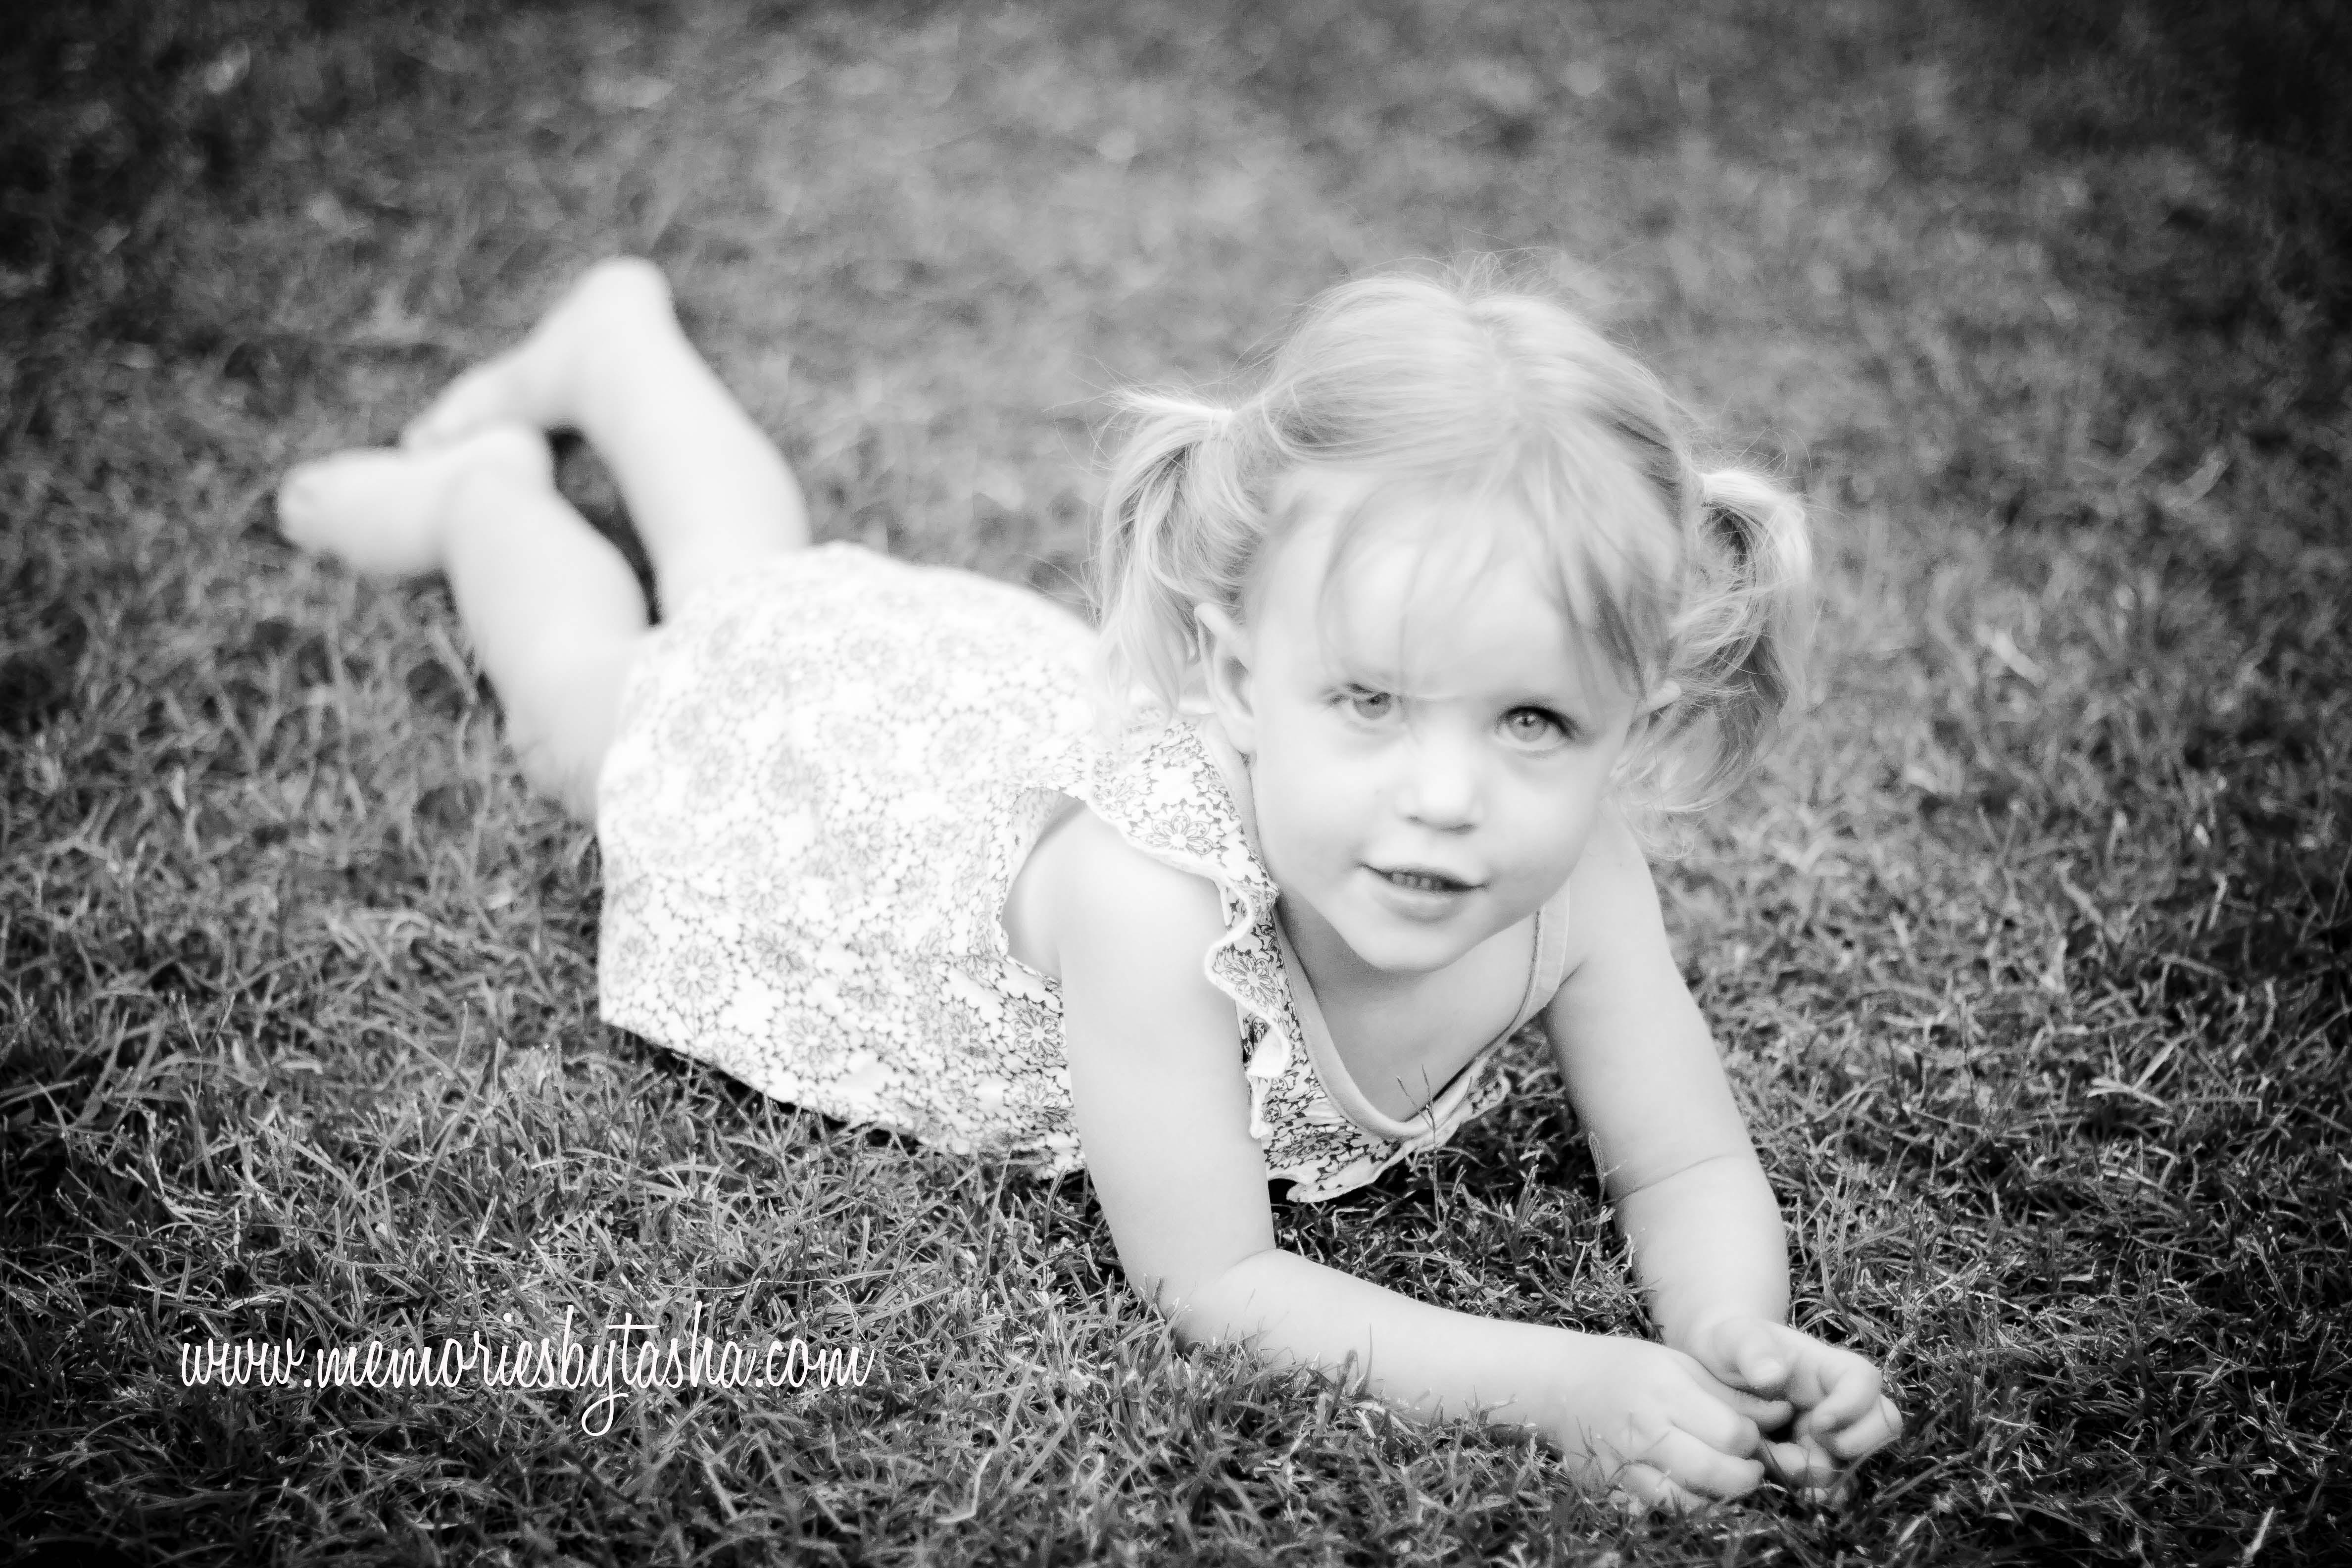 Twentynine Palms Photographer - Maternity Photography - Children's Photography - Family Photography - Pierce-19 copy